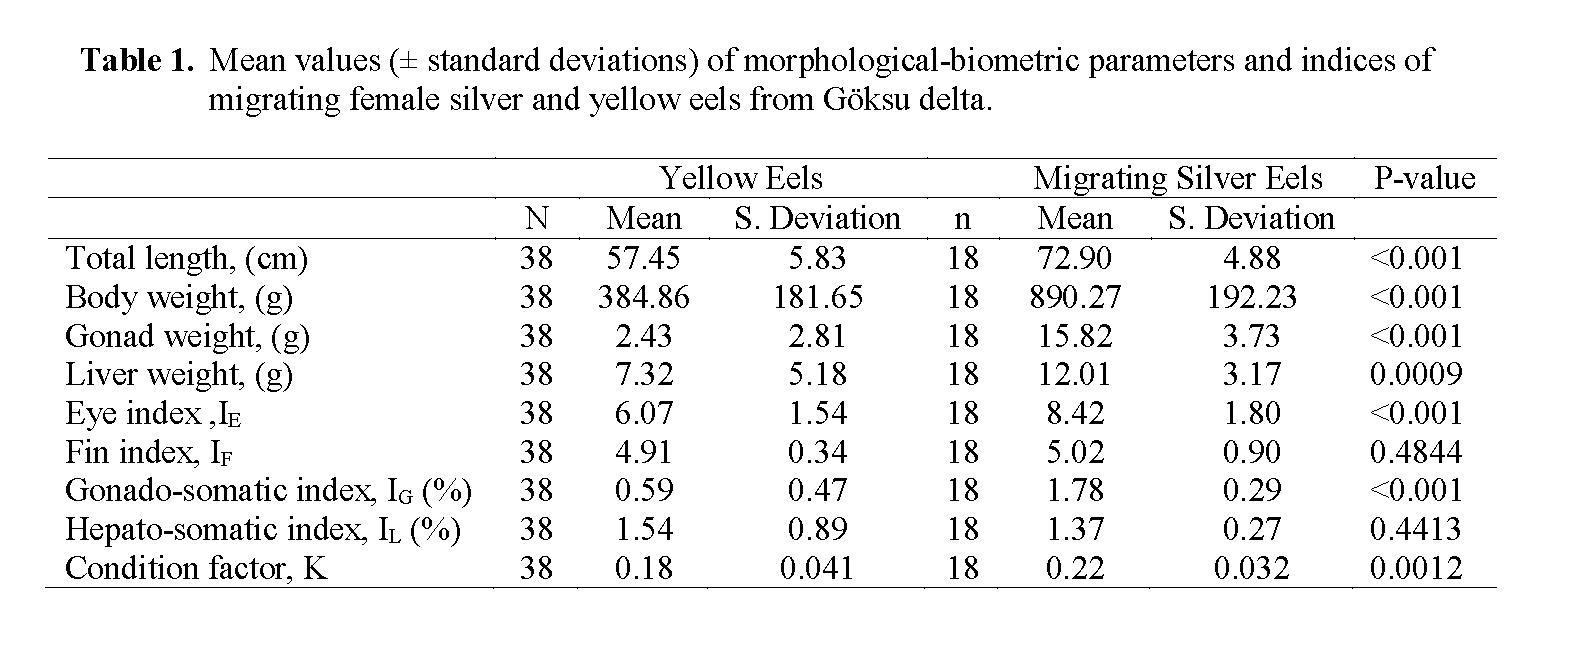 Fisheries-Sciences-Mean-values-standard-deviations-morphological-biometric-parameters